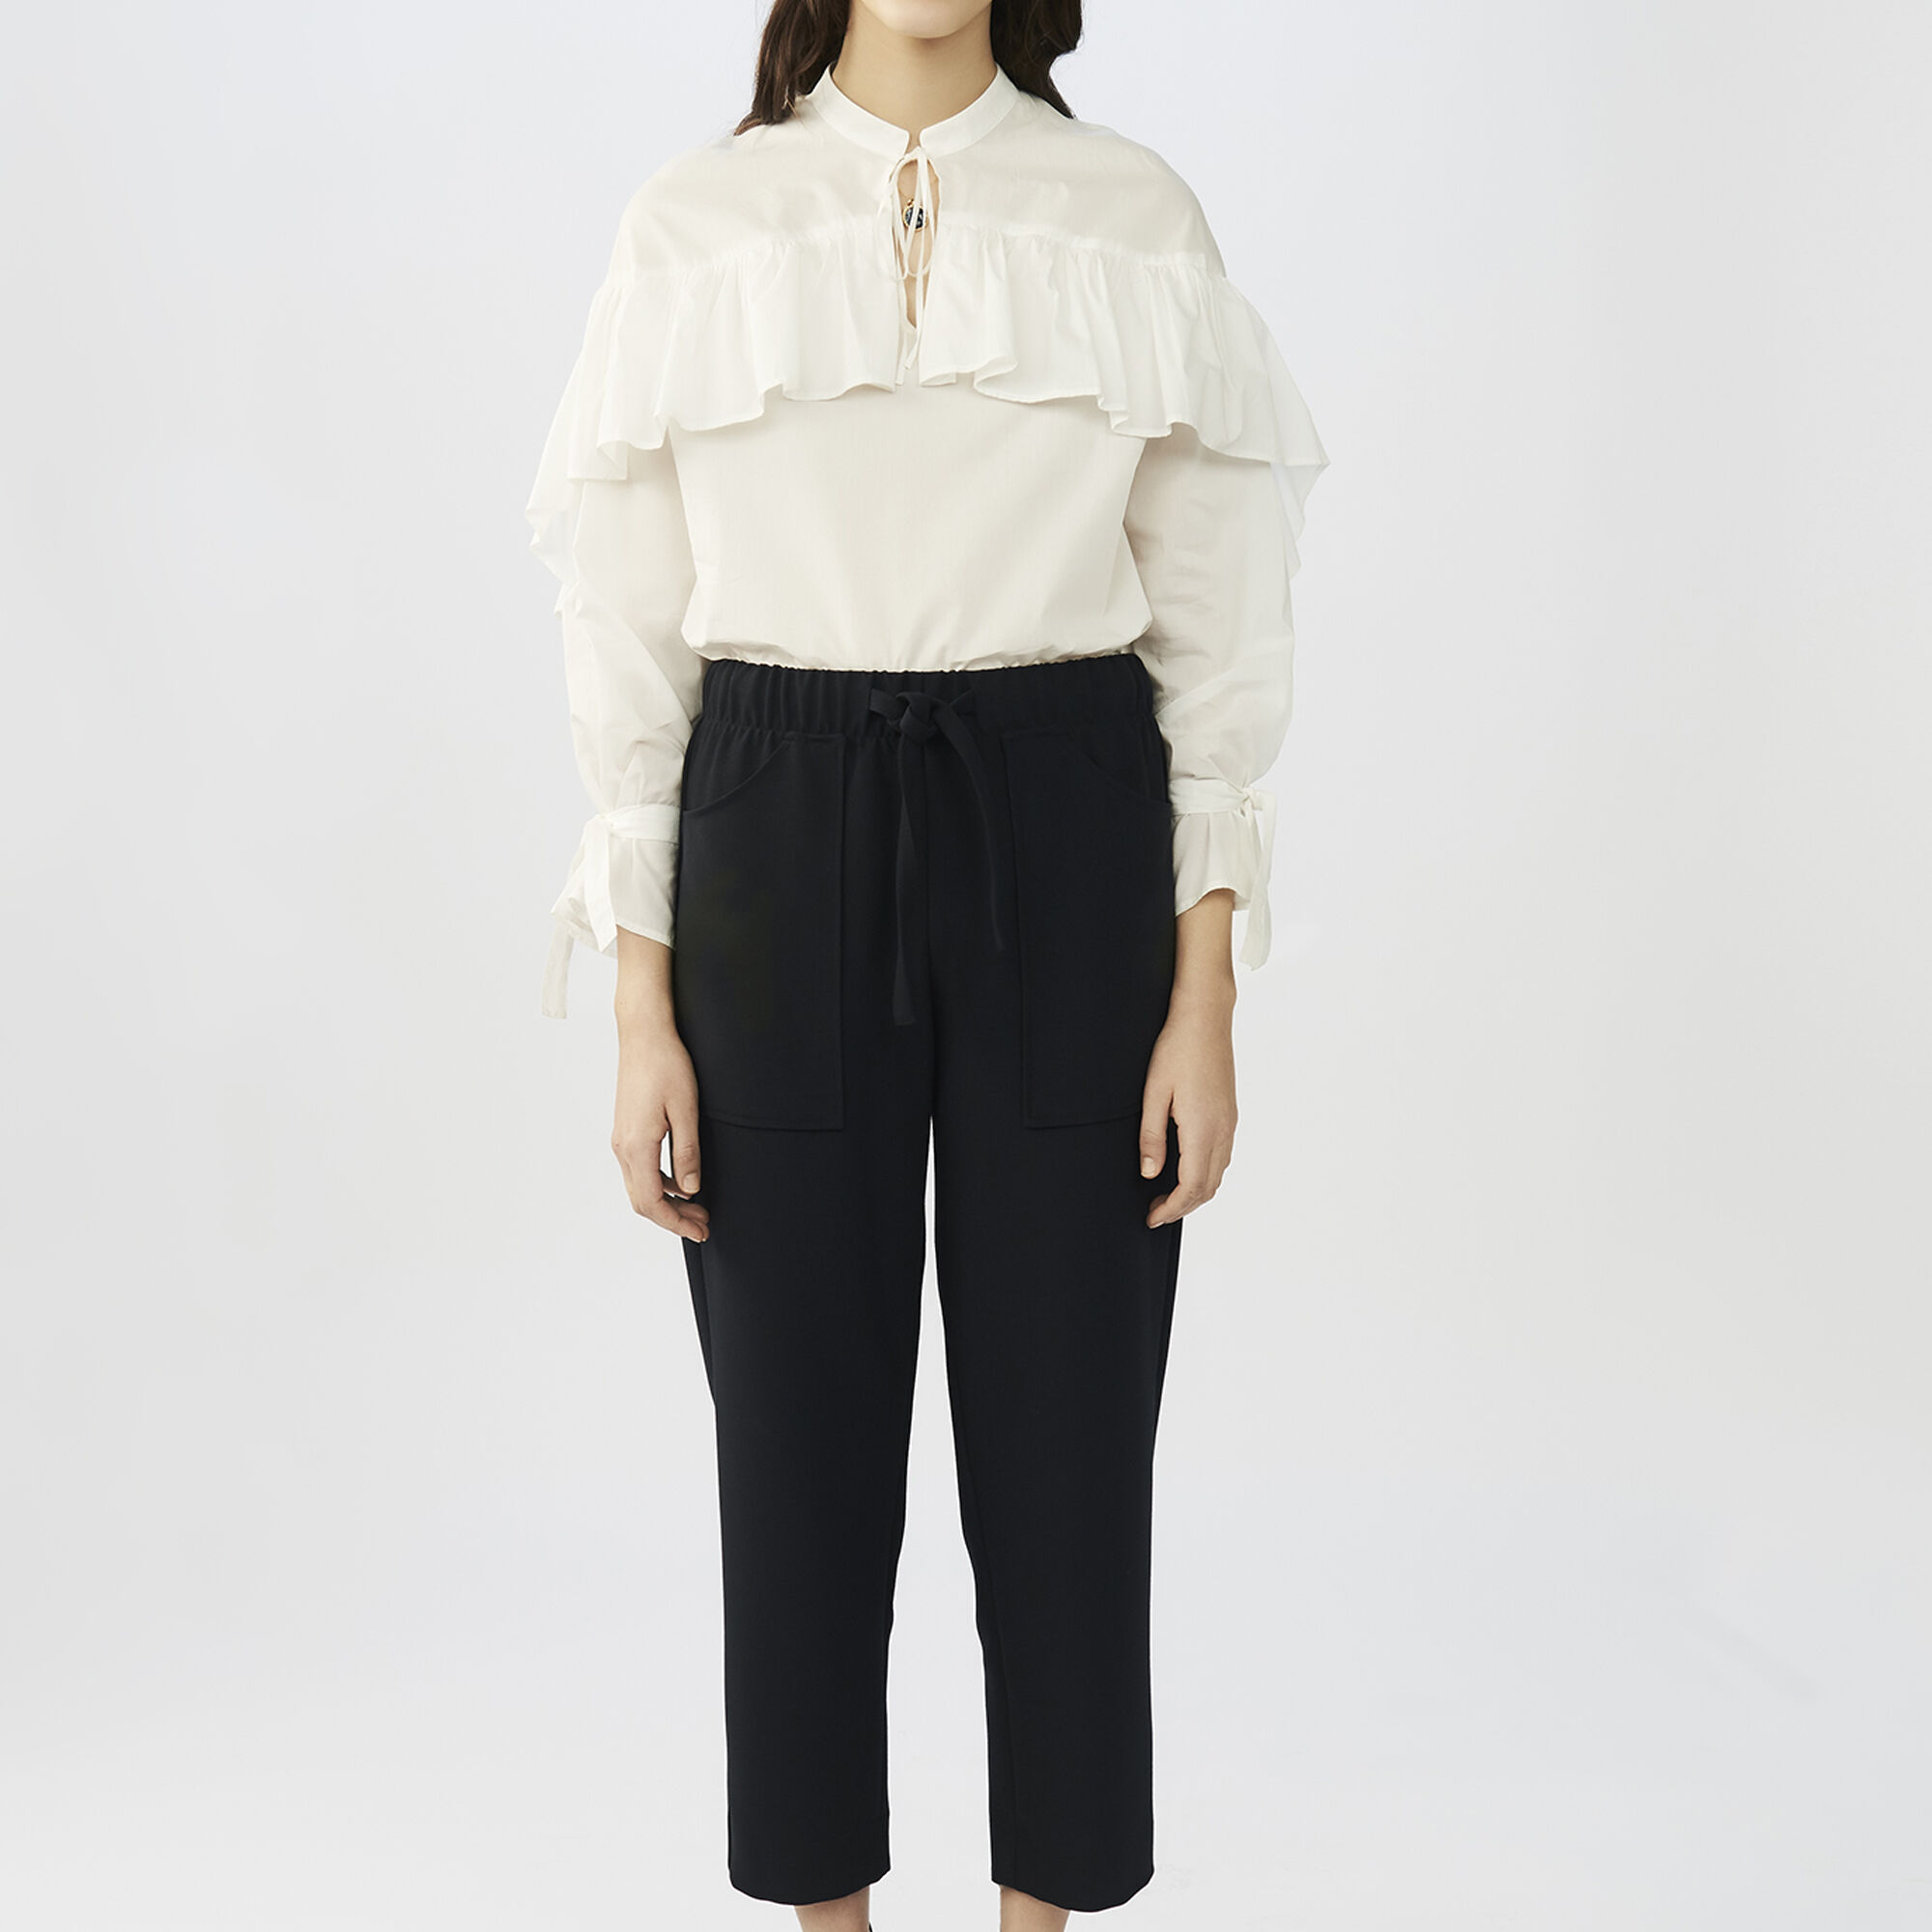 Maje Femme Crêpe Pantalon Large Jambe Blanc Taille 40 Maje AgUQKPG9